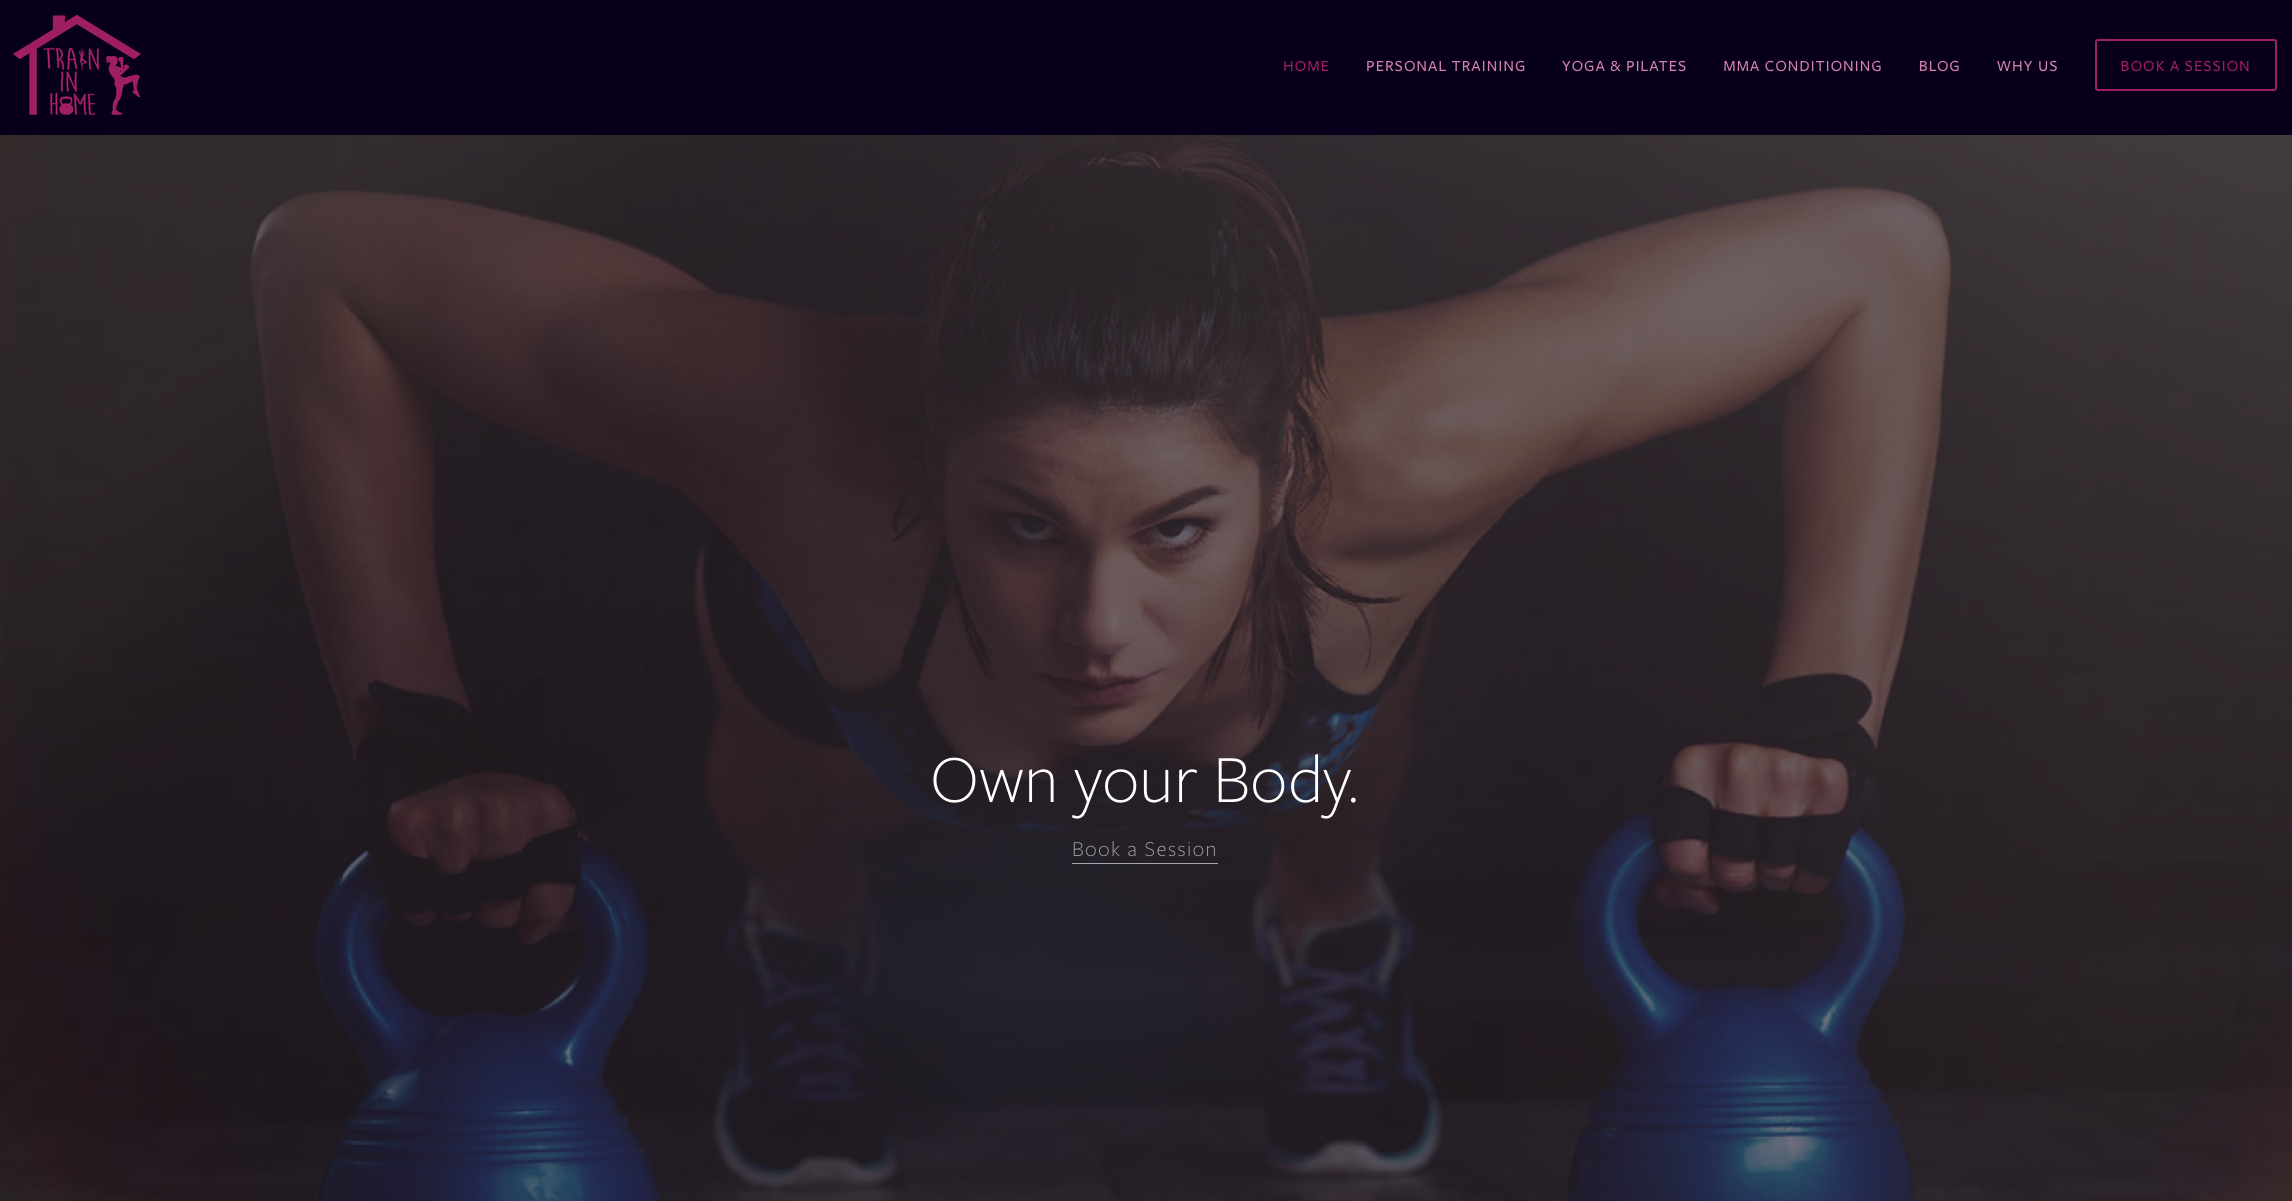 personal training websites glenview illinois